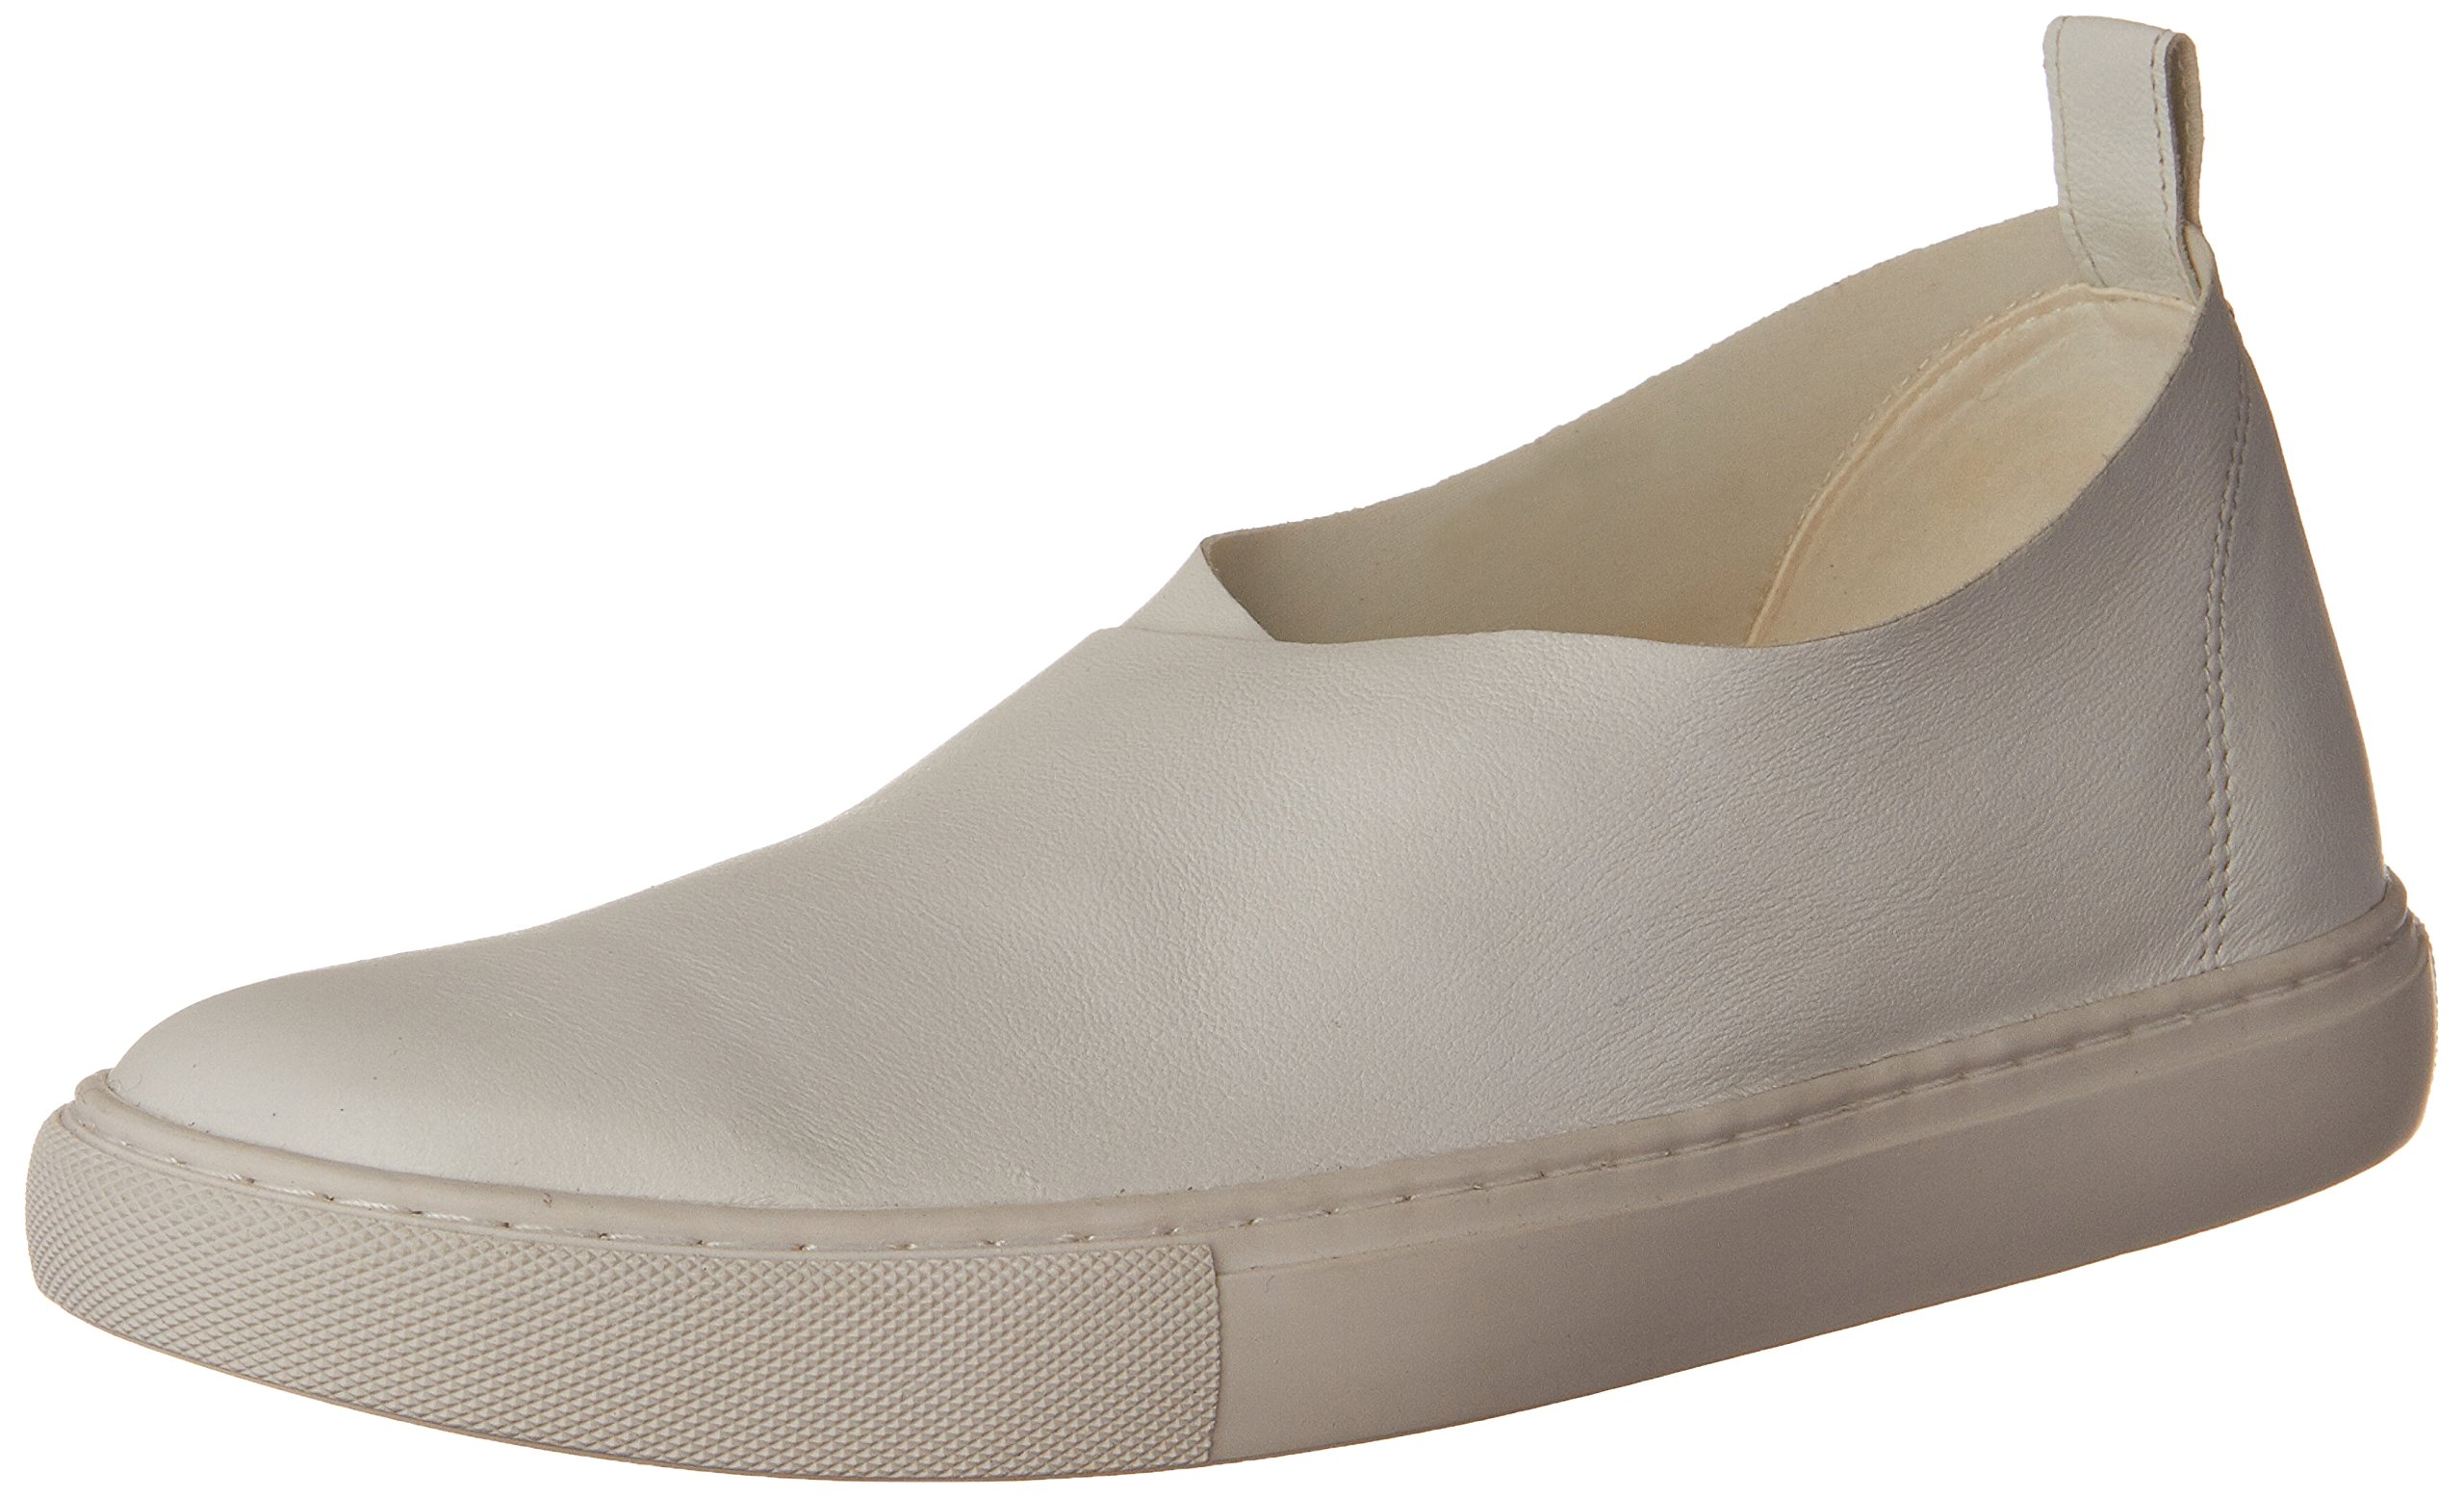 Kenneth Cole Basses KathySneakers Eu 11041 FemmeBlancwhite hQrxtsCd